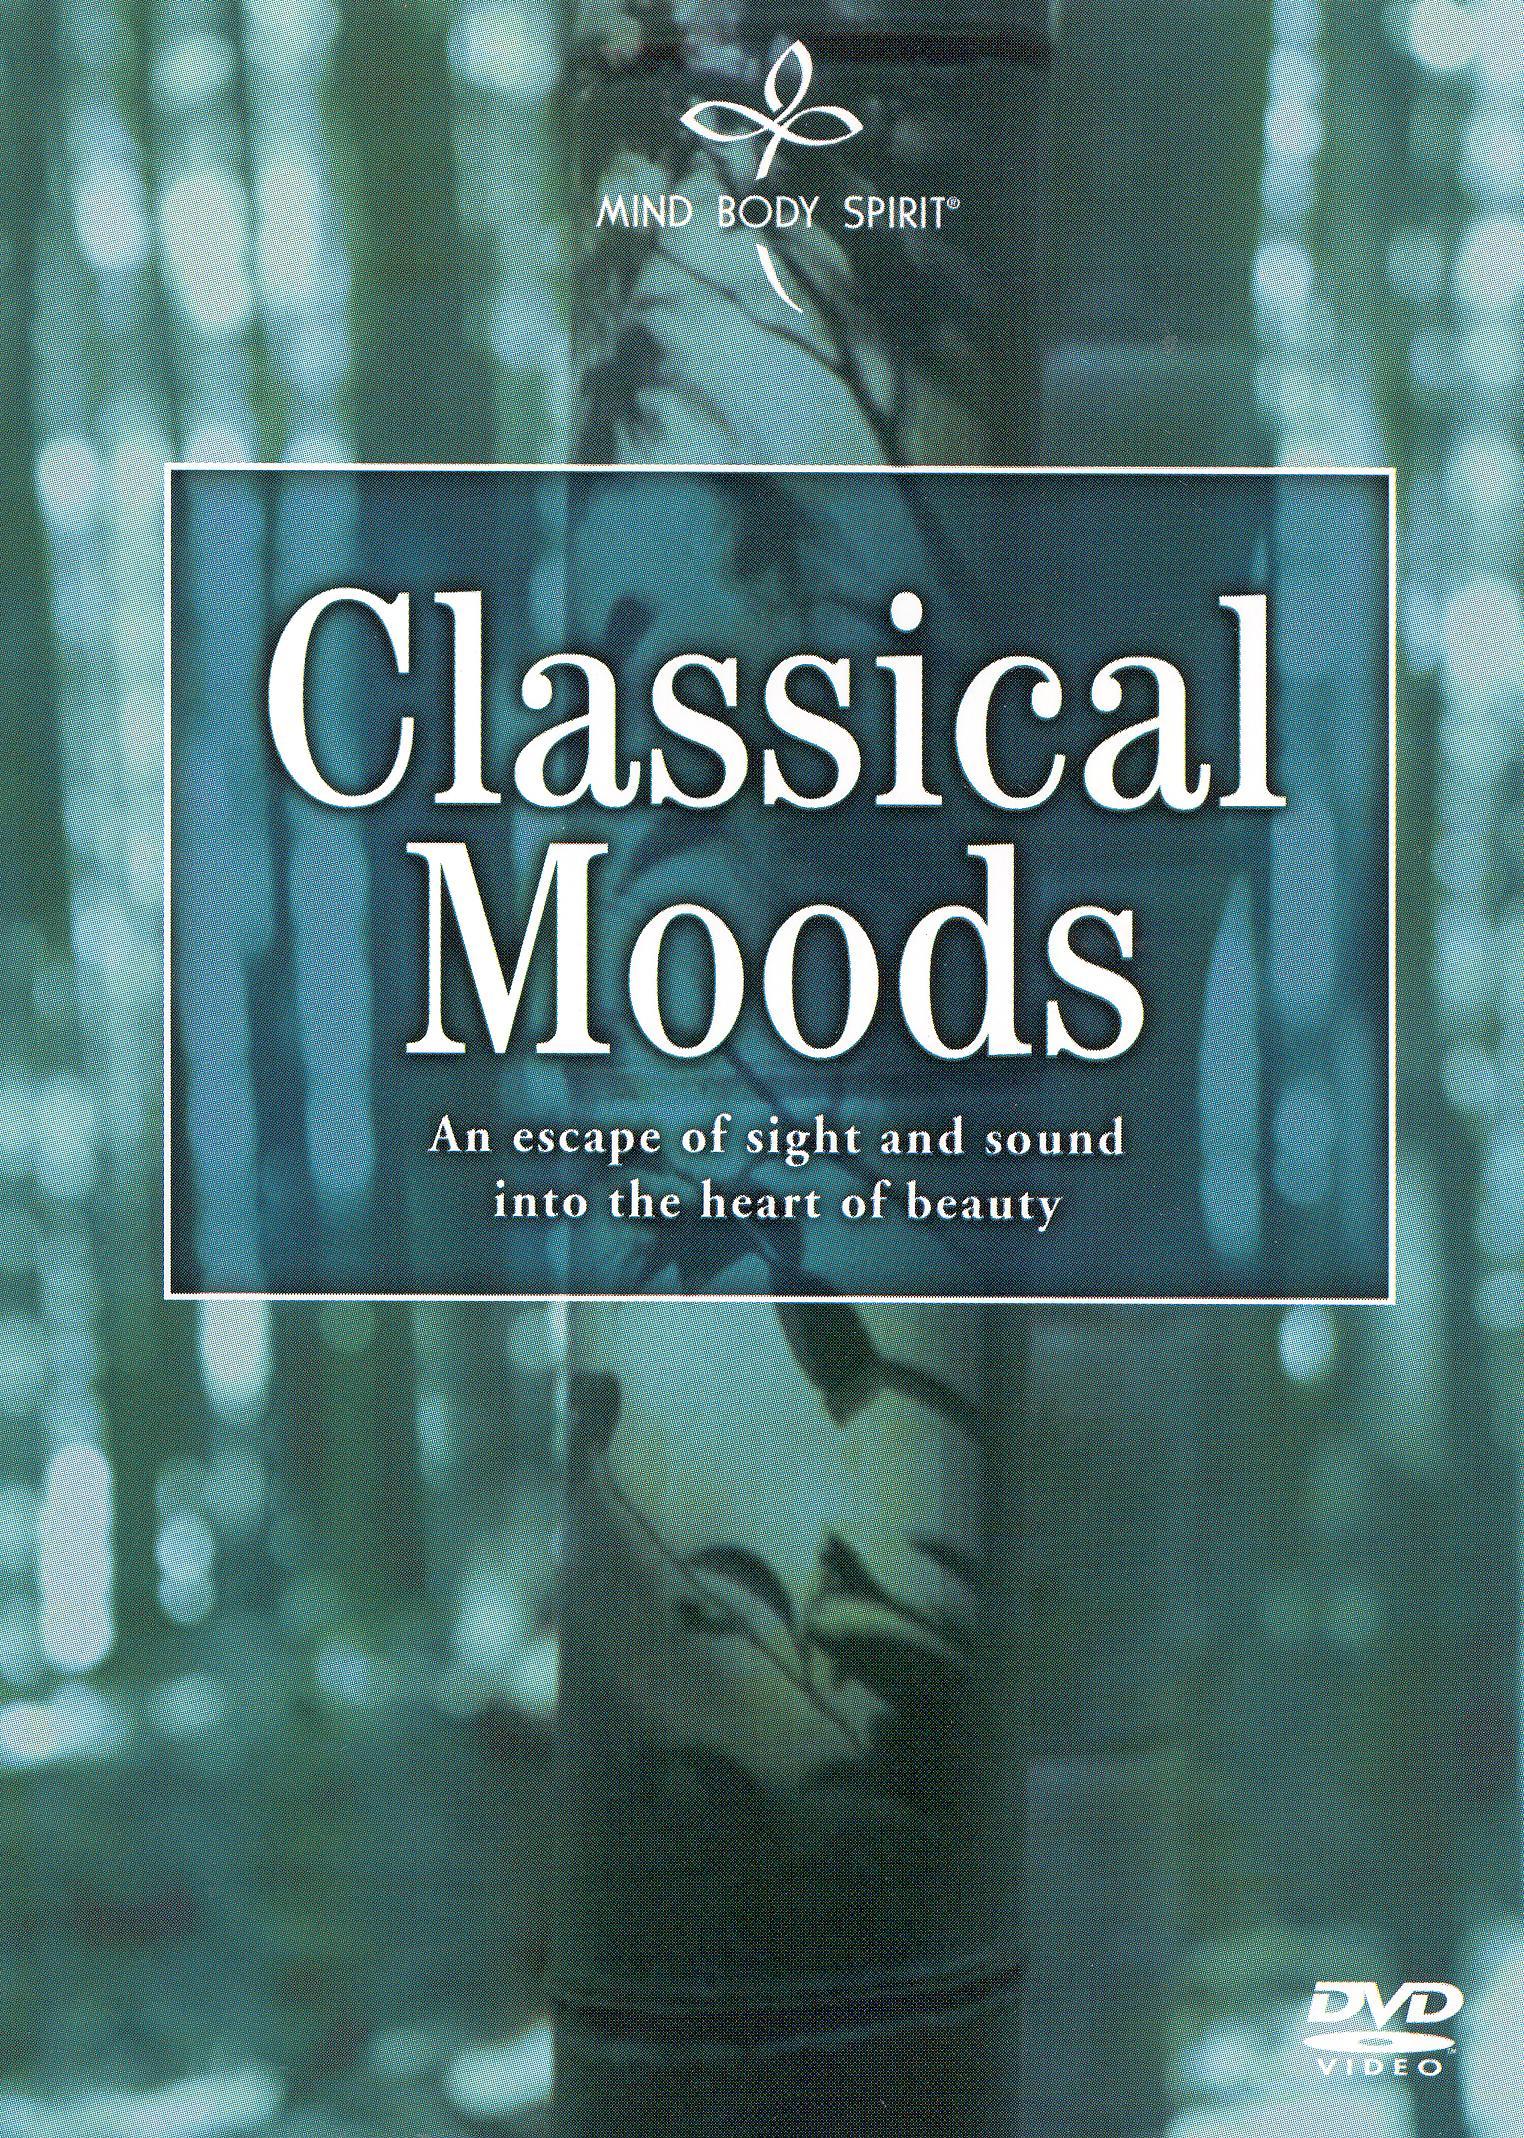 Mind Body Spirit: Classical Moods